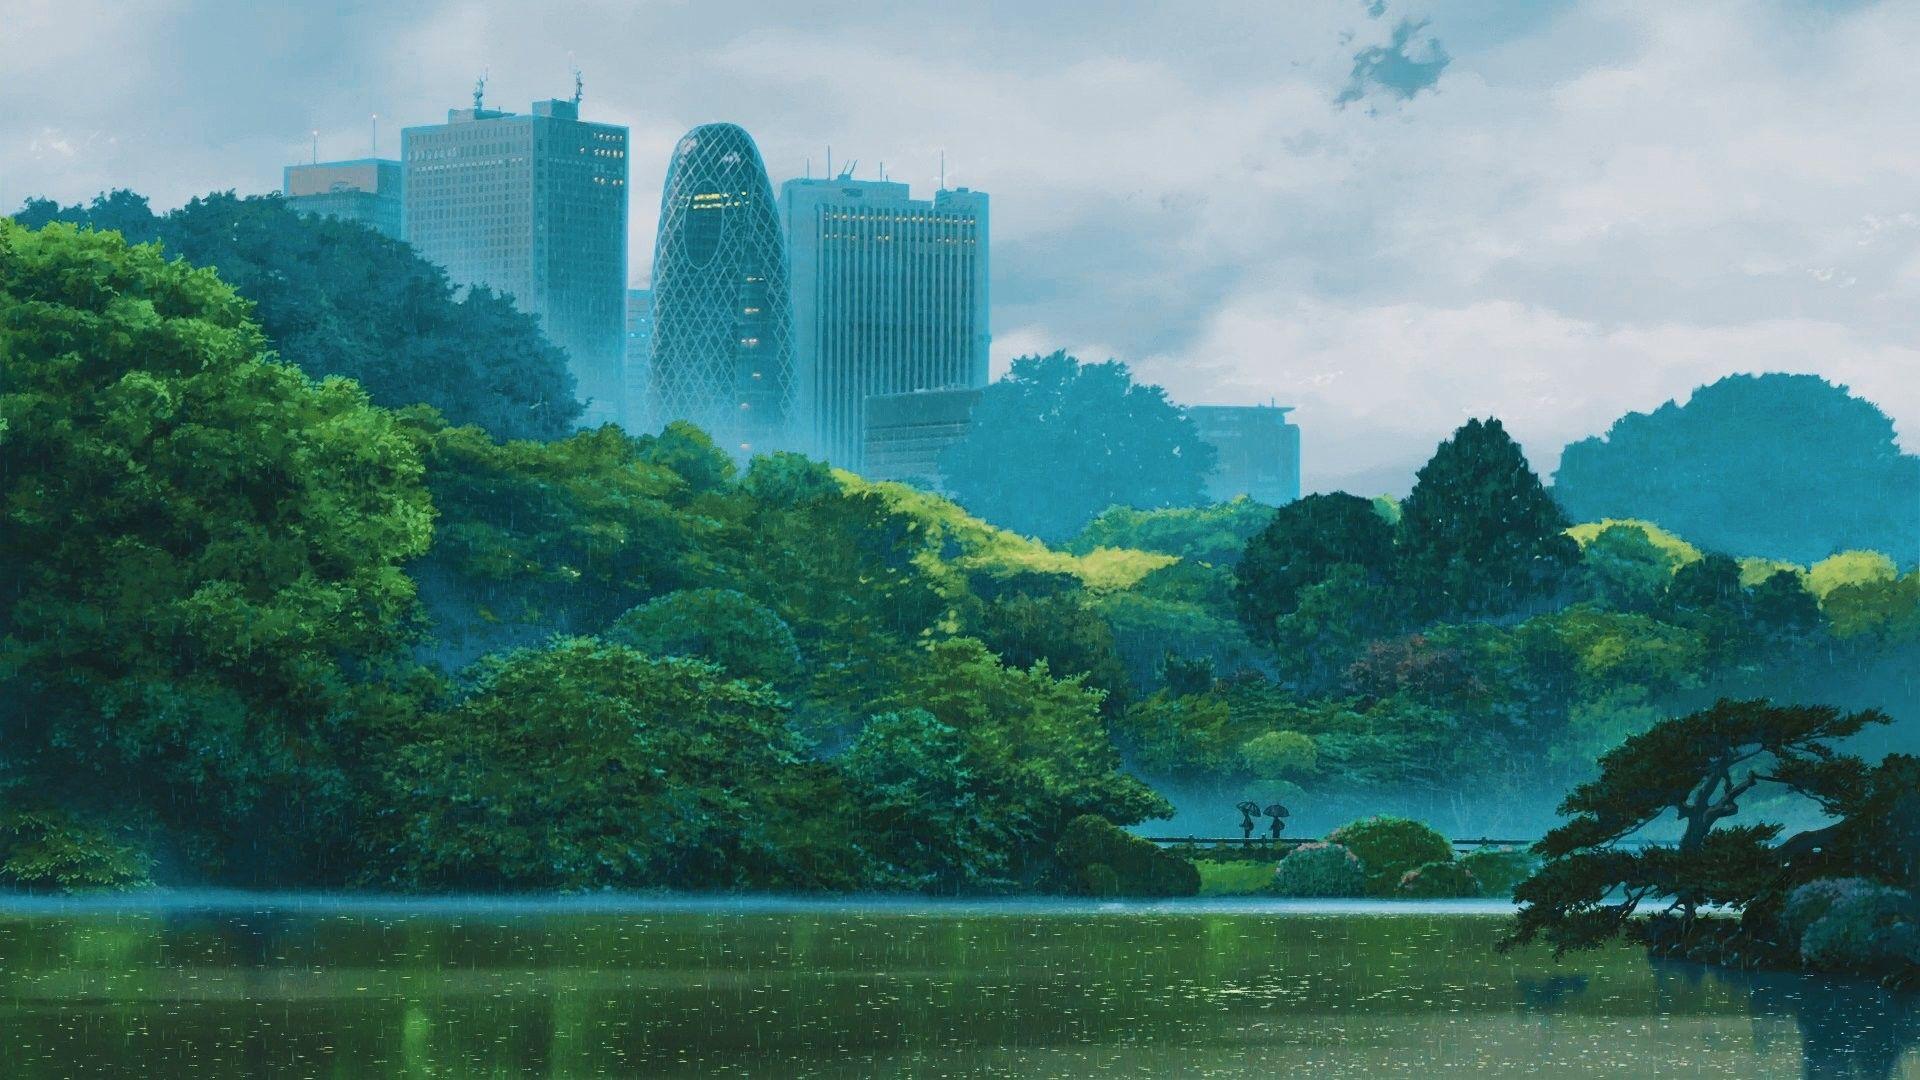 1920x1080 Garden Of Words Makoto Shinkai Kotonoha No Niwa Garden Of Words Anime Scenery Anime Background